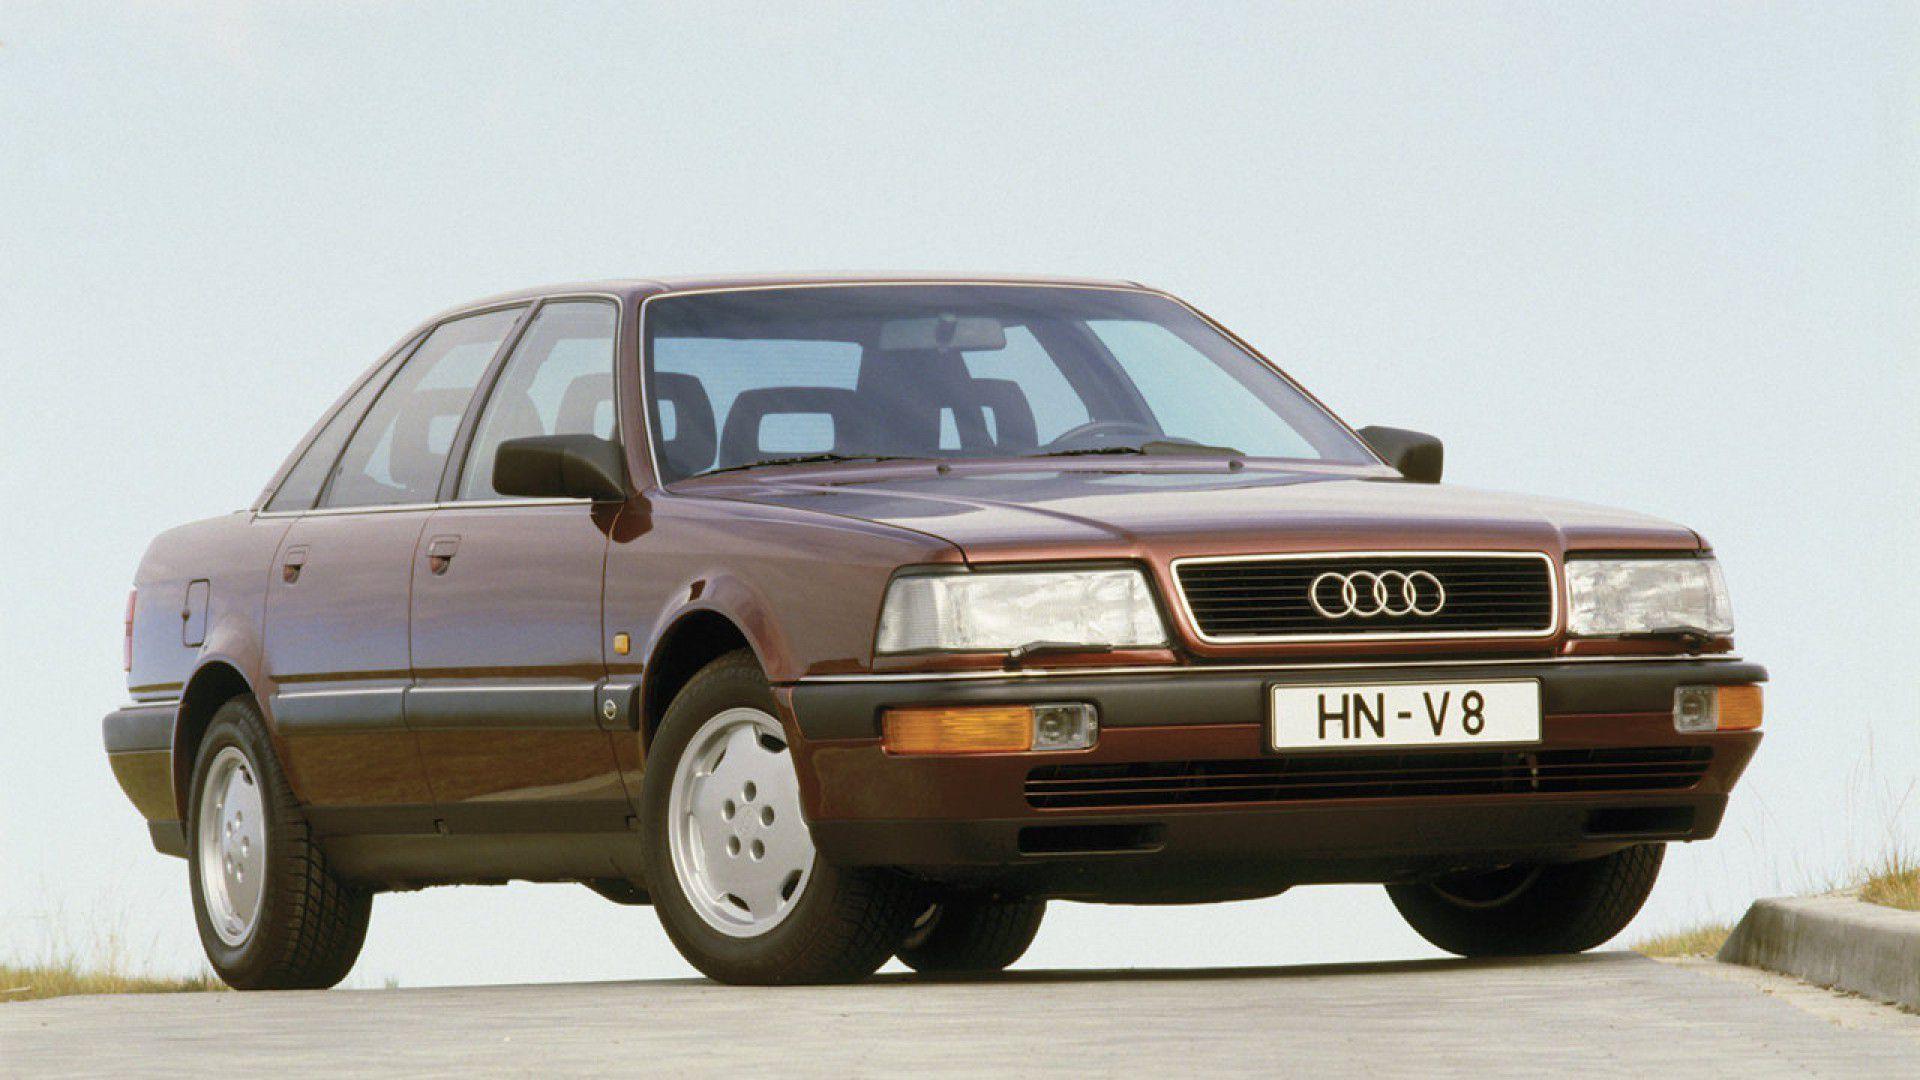 Audi V8 (1988 to 1995)